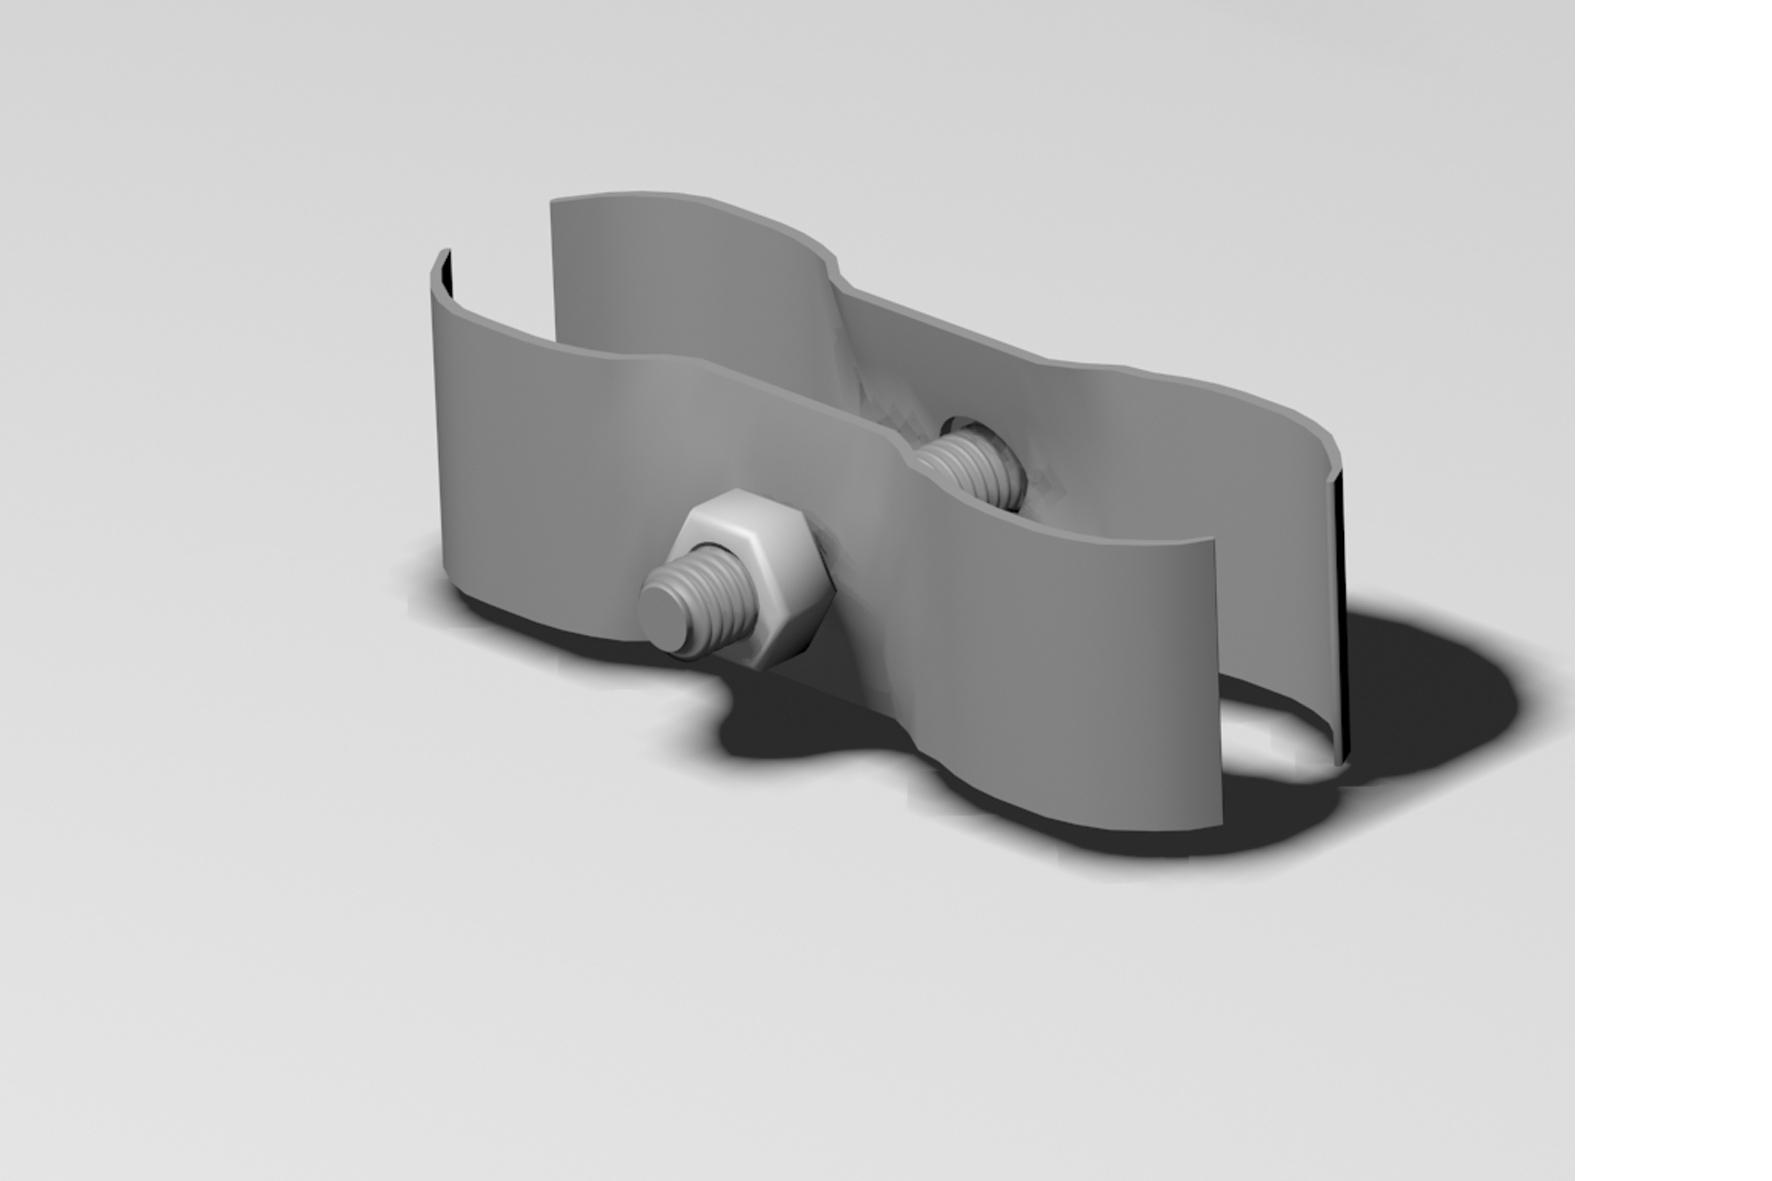 collier cl ture mobile achat en ligne ou dans notre magasin. Black Bedroom Furniture Sets. Home Design Ideas